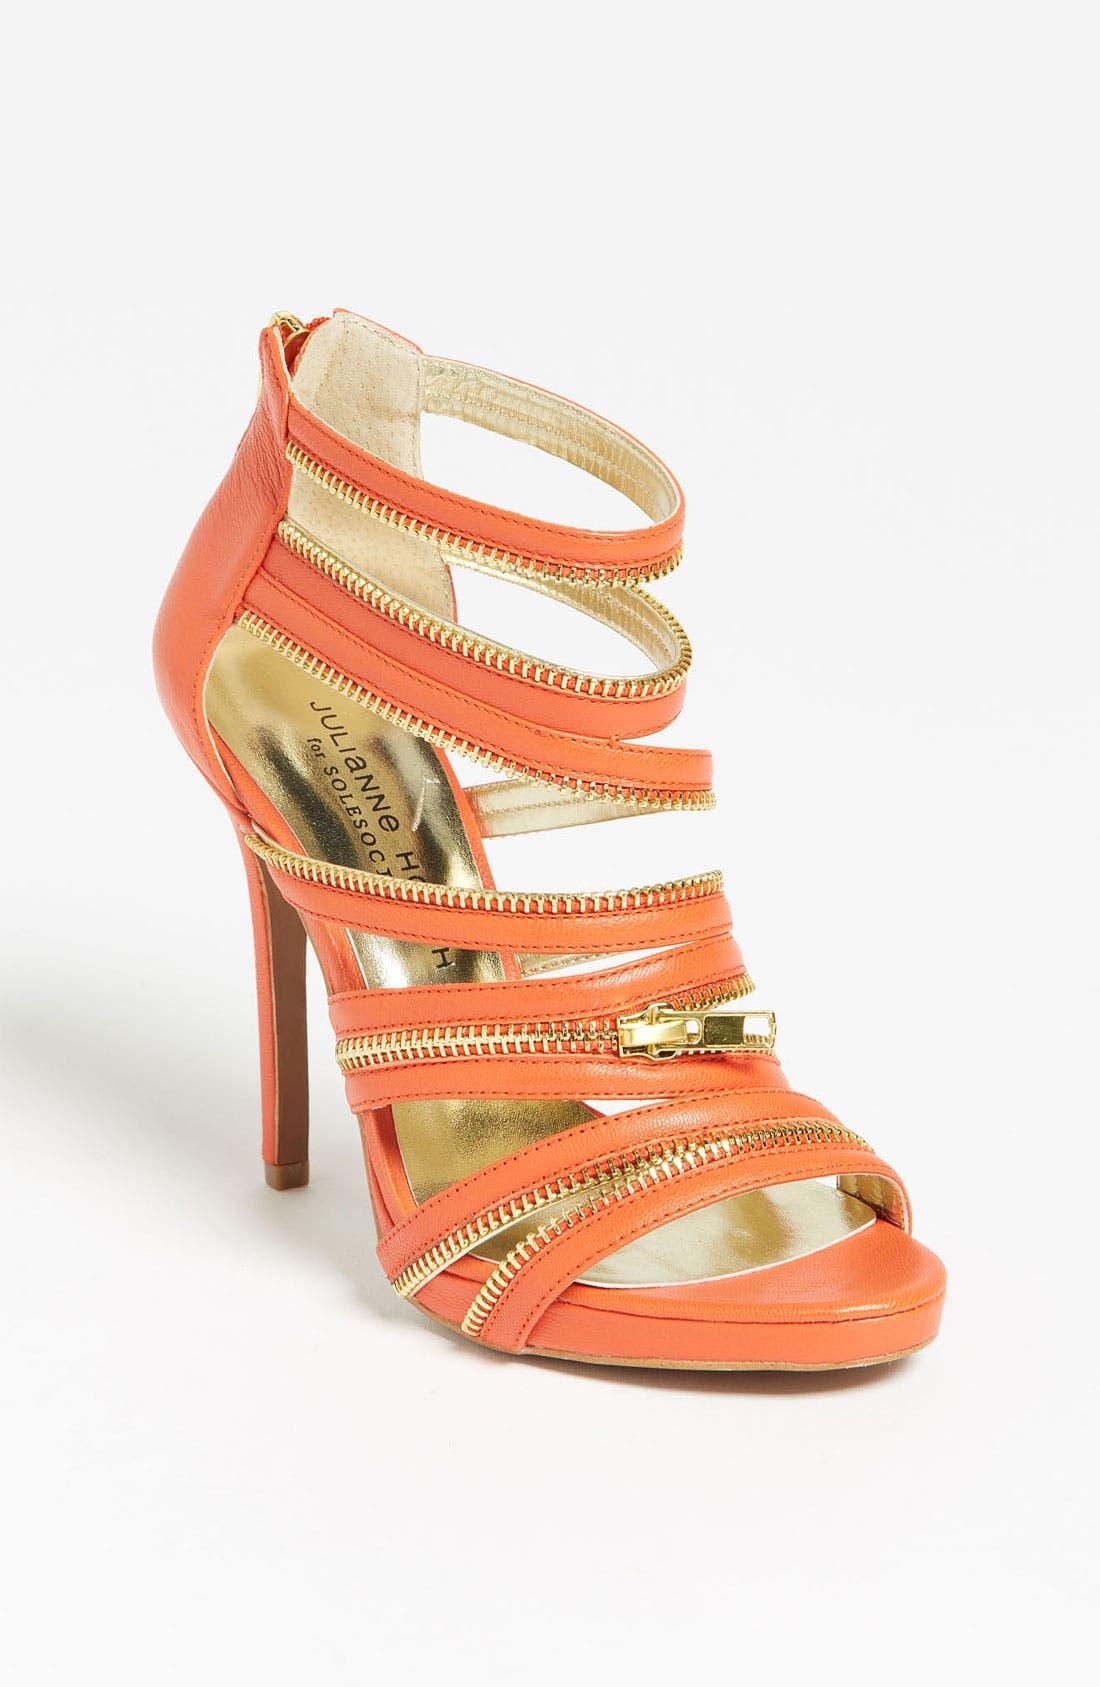 Alternate Image 1 Selected - Julianne Hough for Sole Society 'Makenna' Sandal